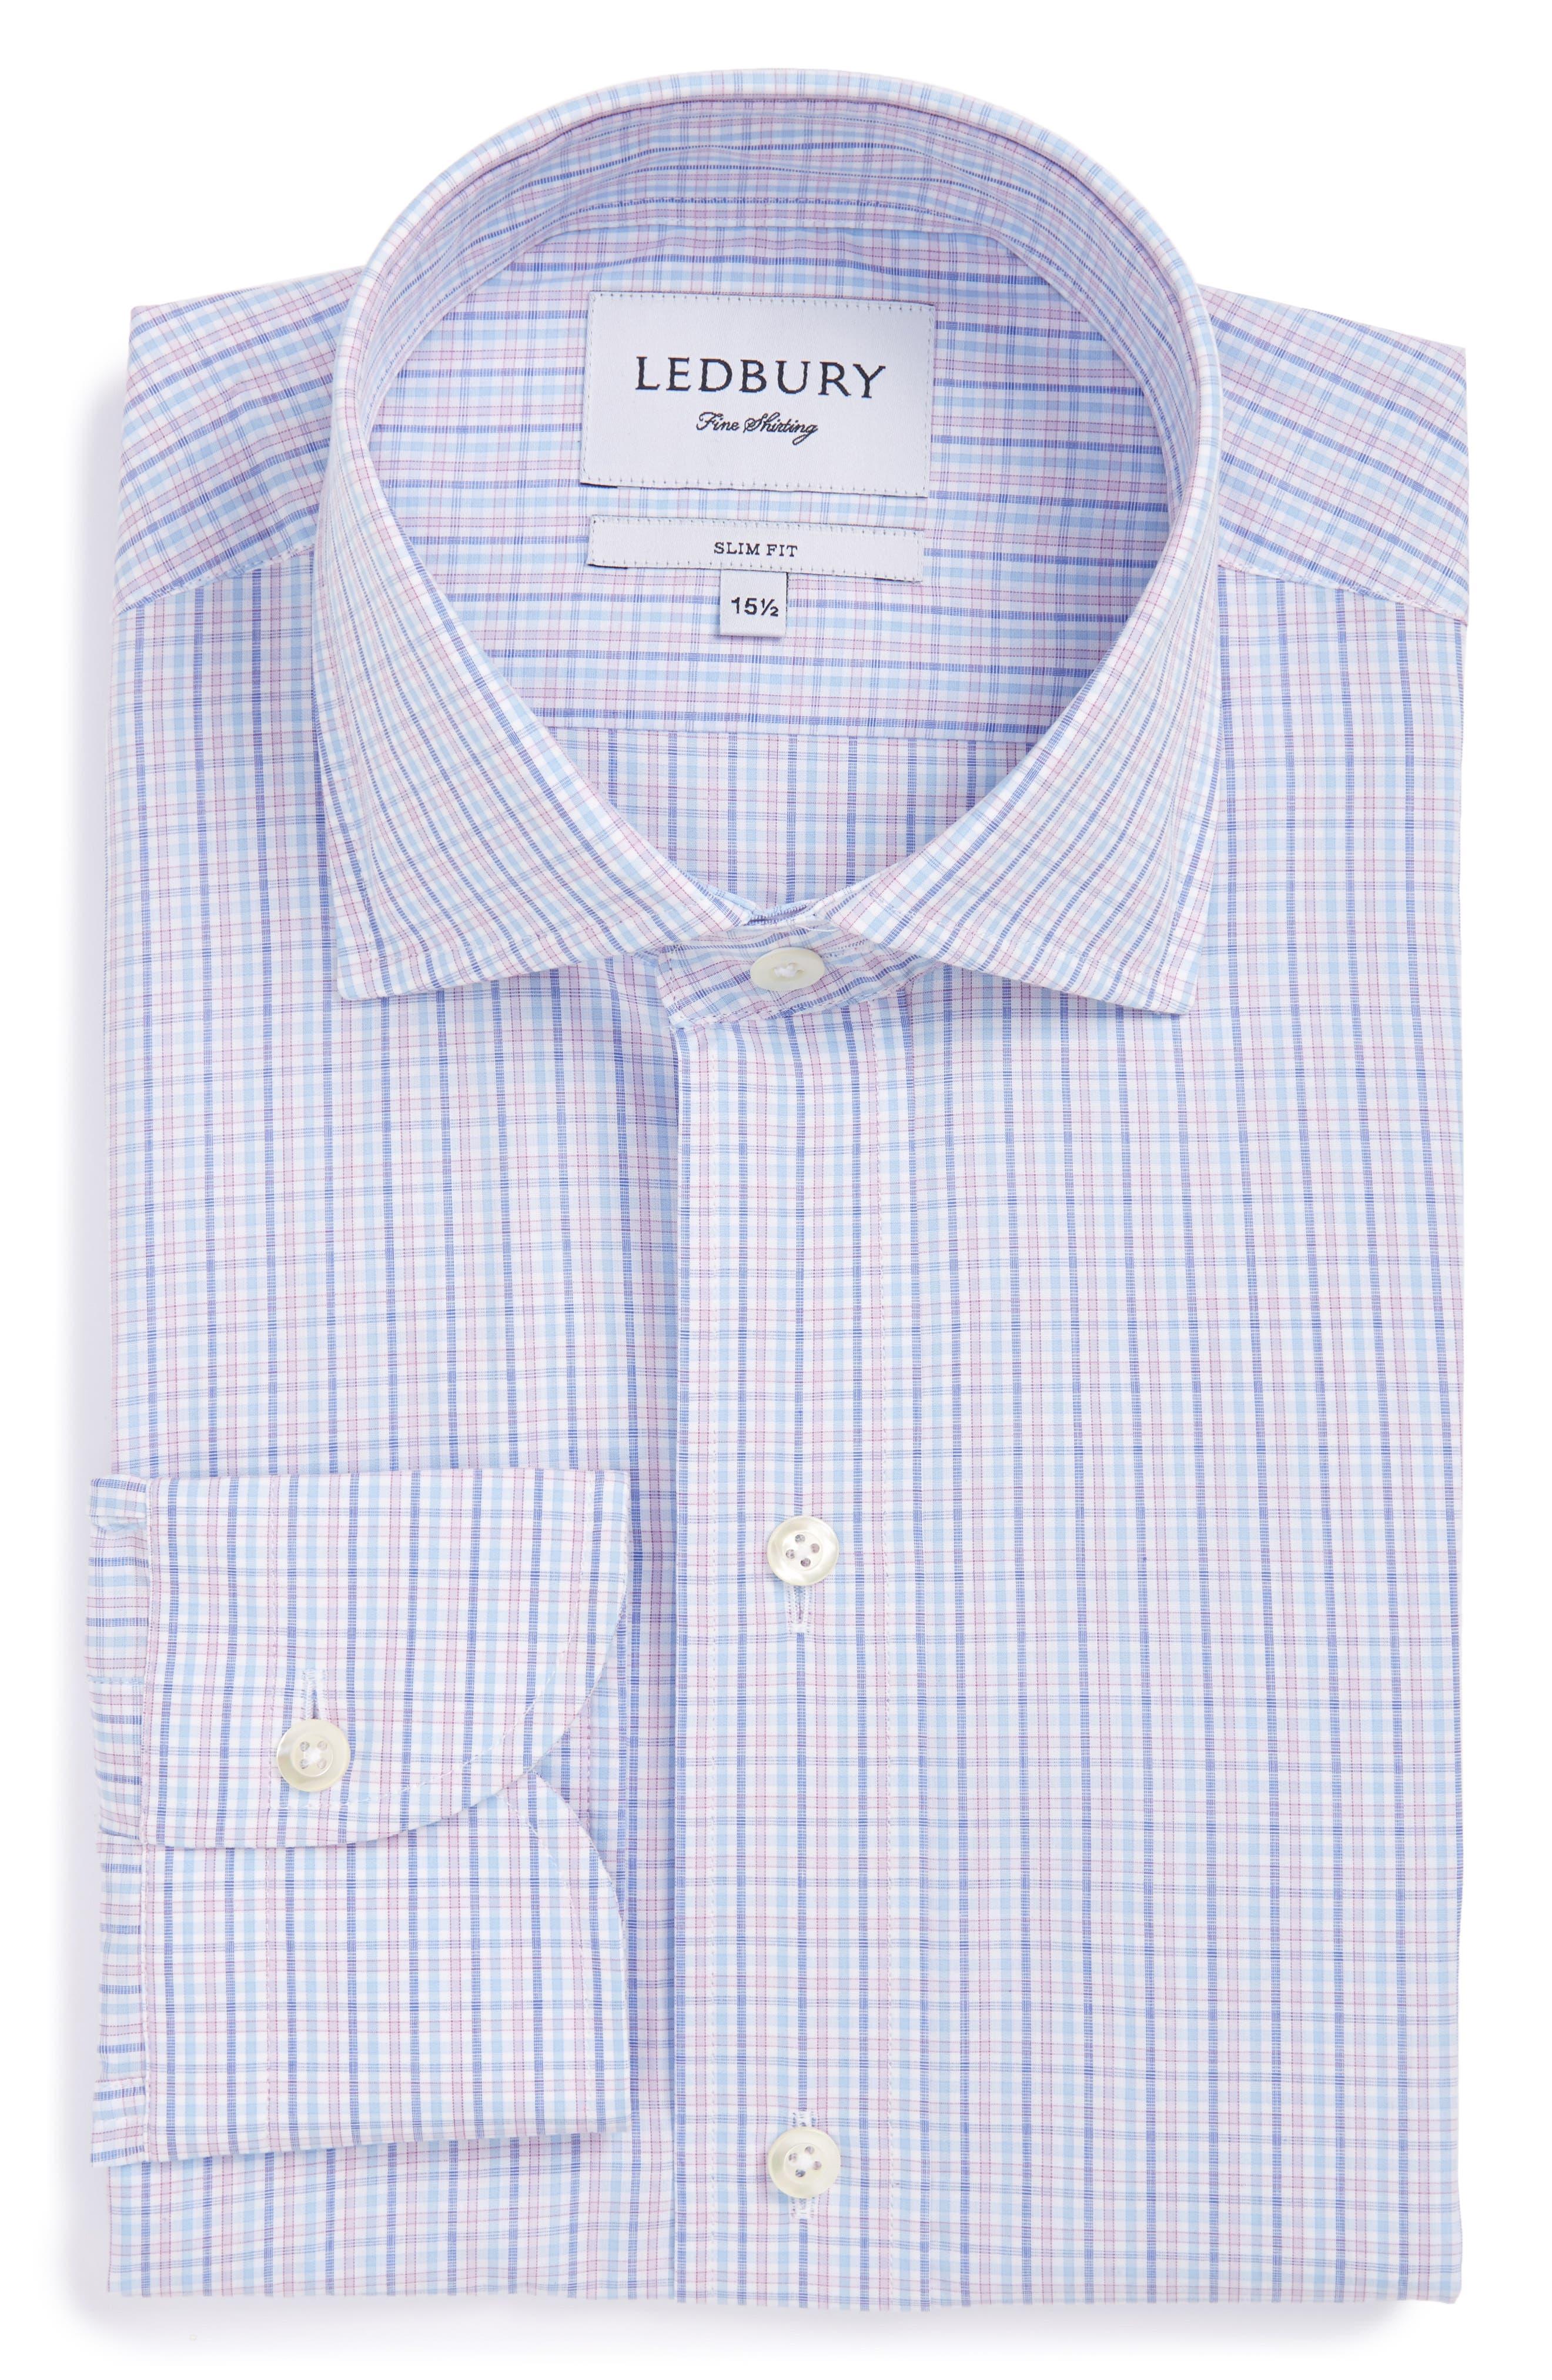 Ledbury Supercore The Eldridge Check Slim Fit Dress Shirt